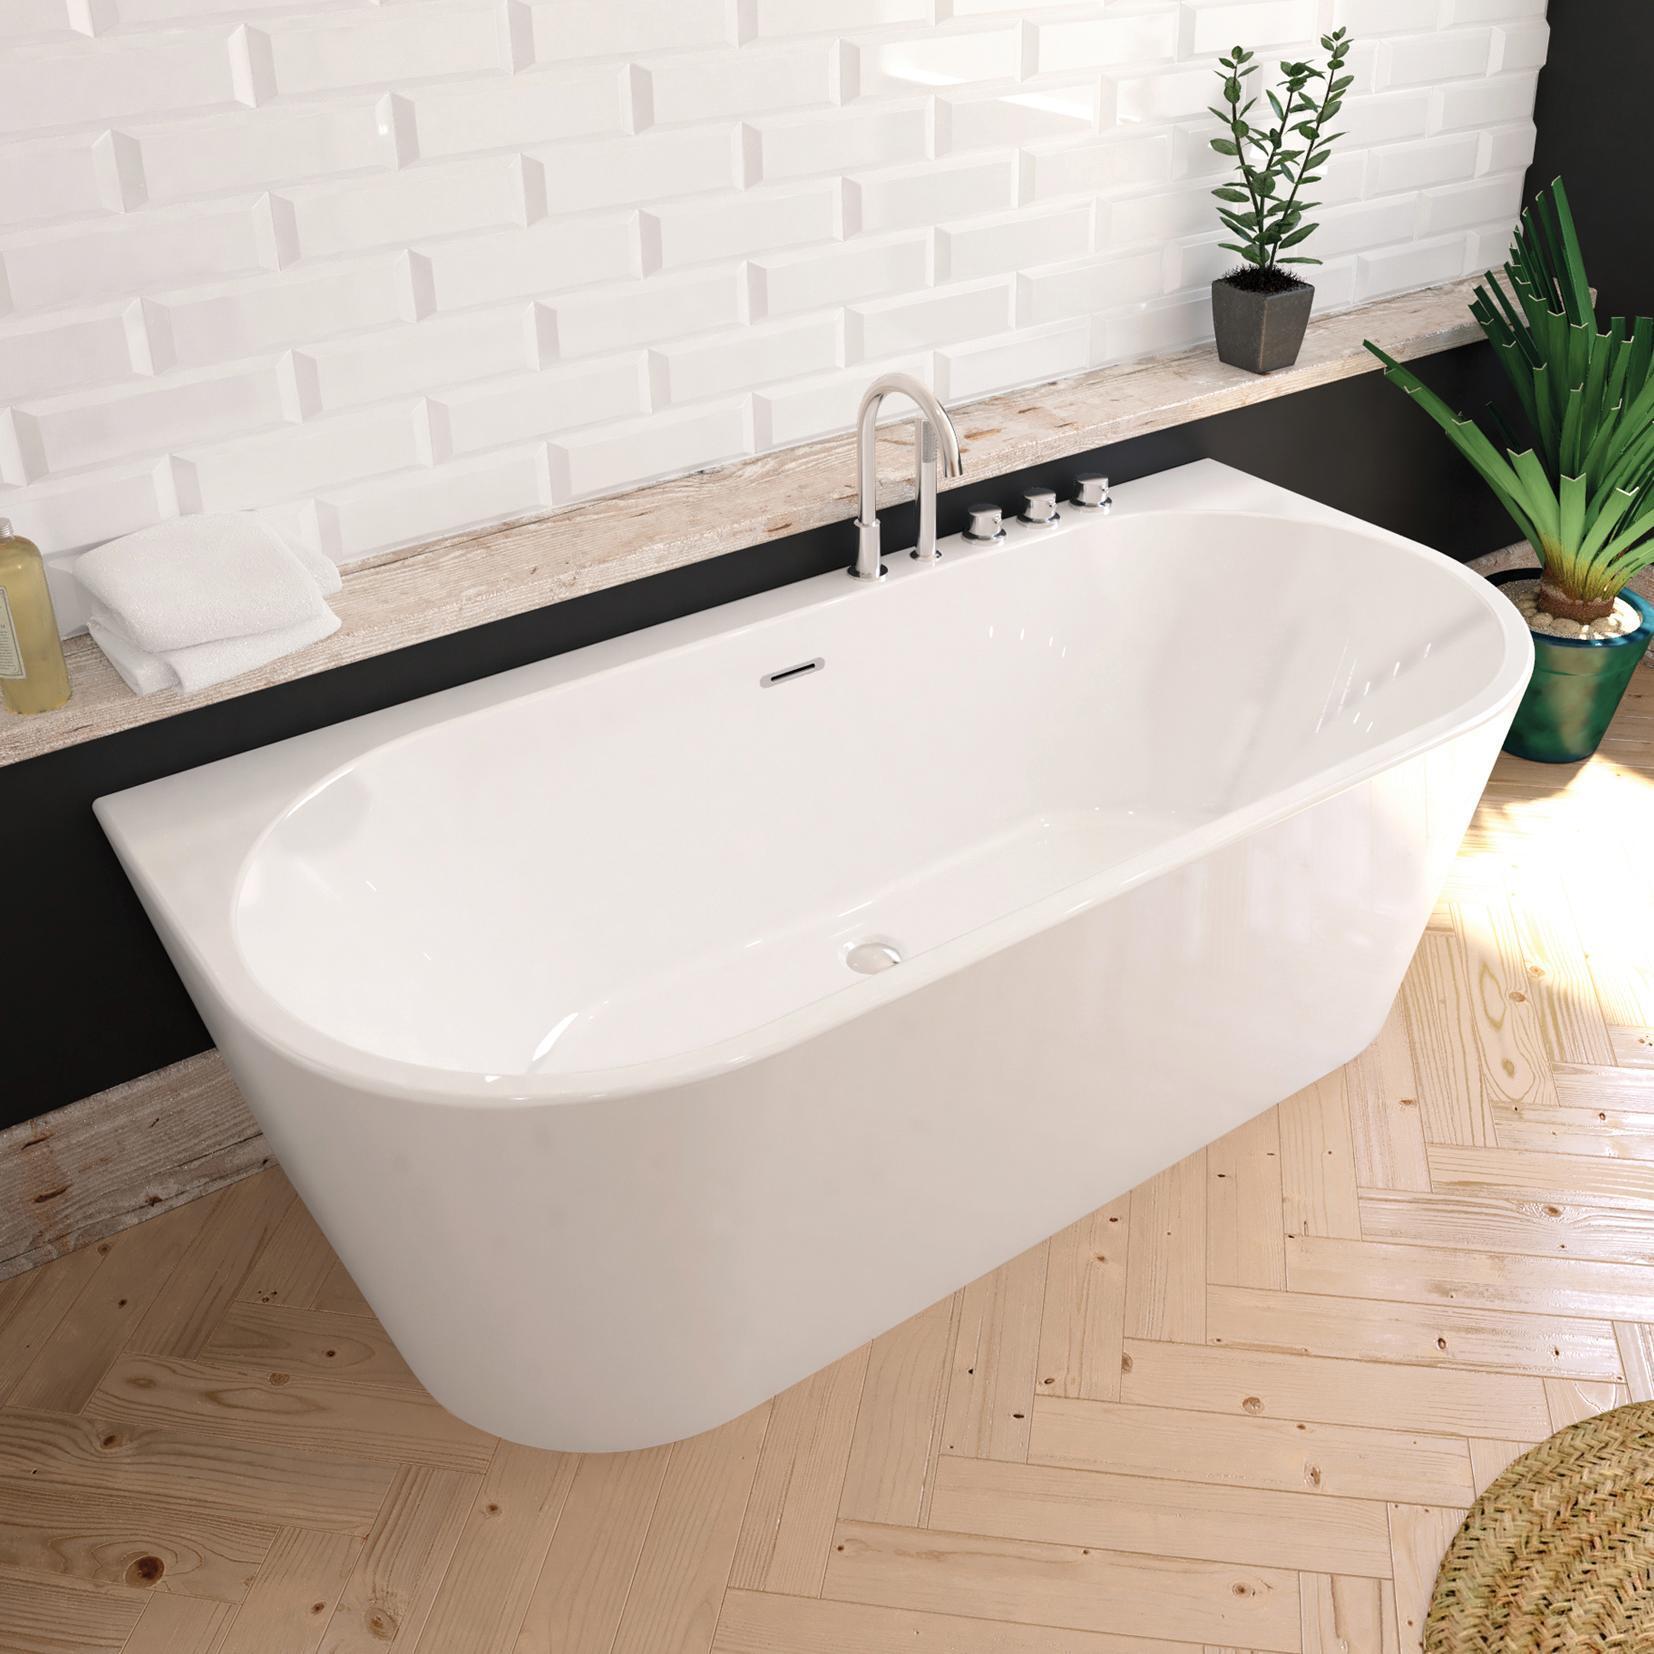 Vasca rettangolare Torino bianco 170 x 80 cm SANYCCES - 1